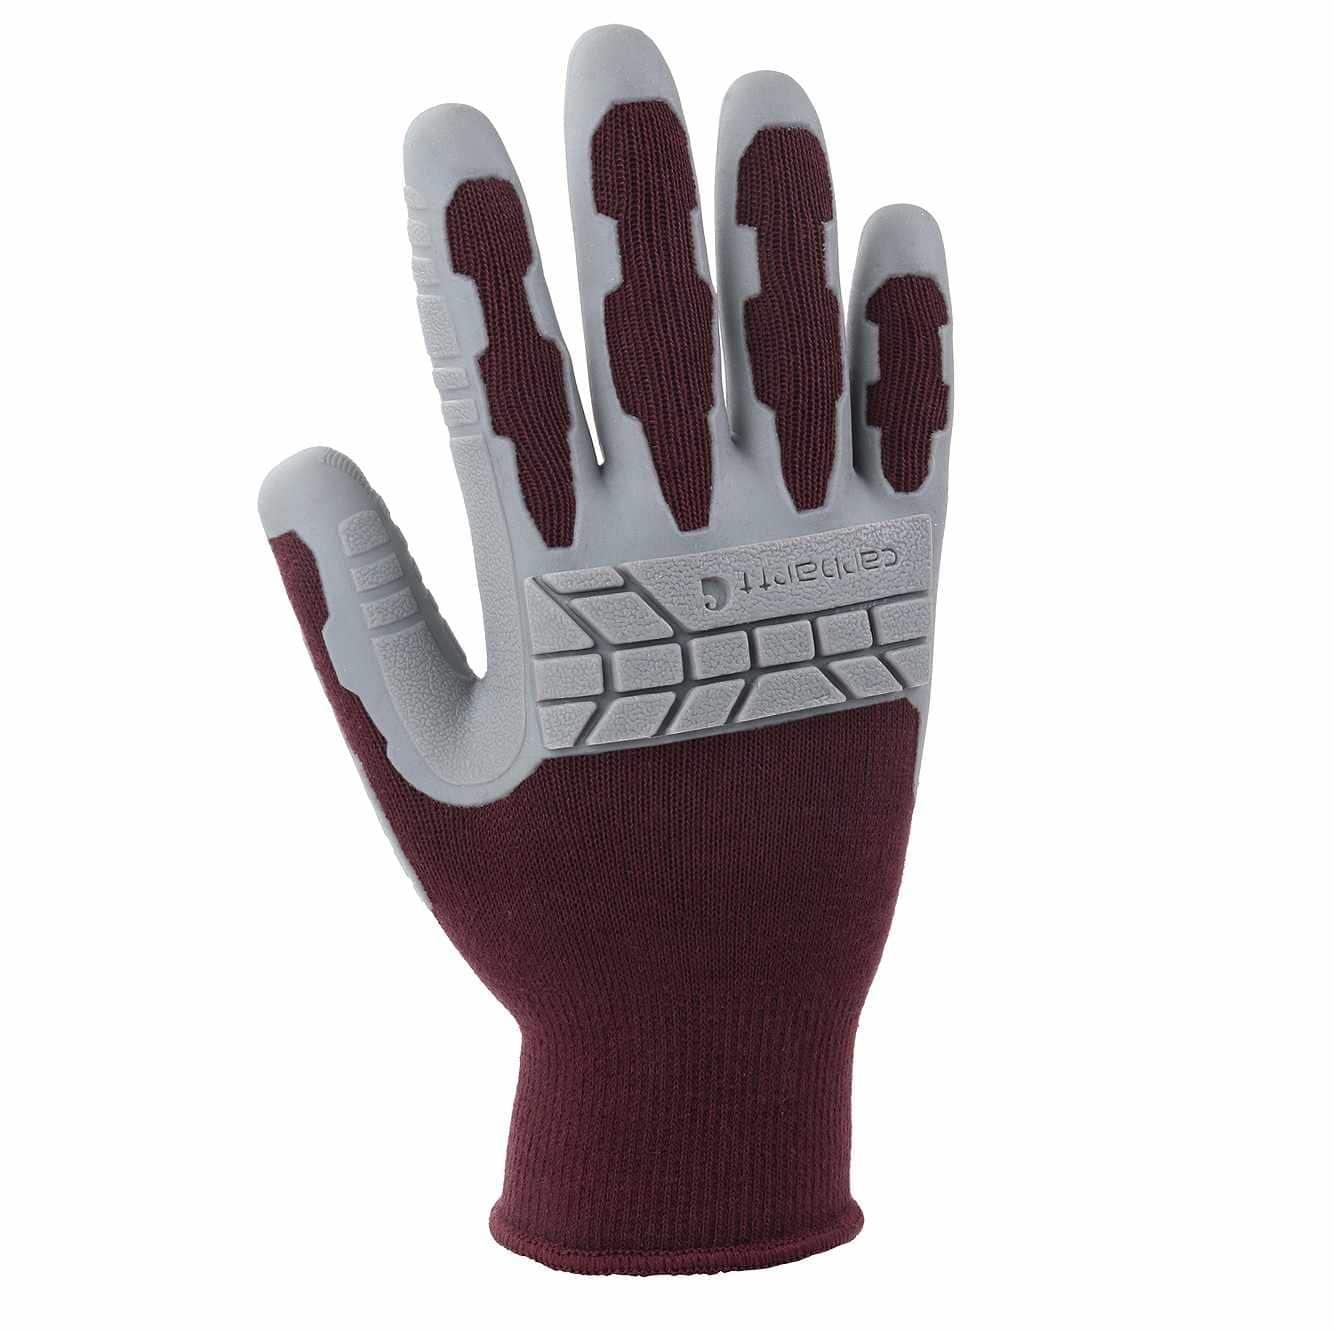 Picture of Knuckler C-Grip® Glove in Dusty Plum